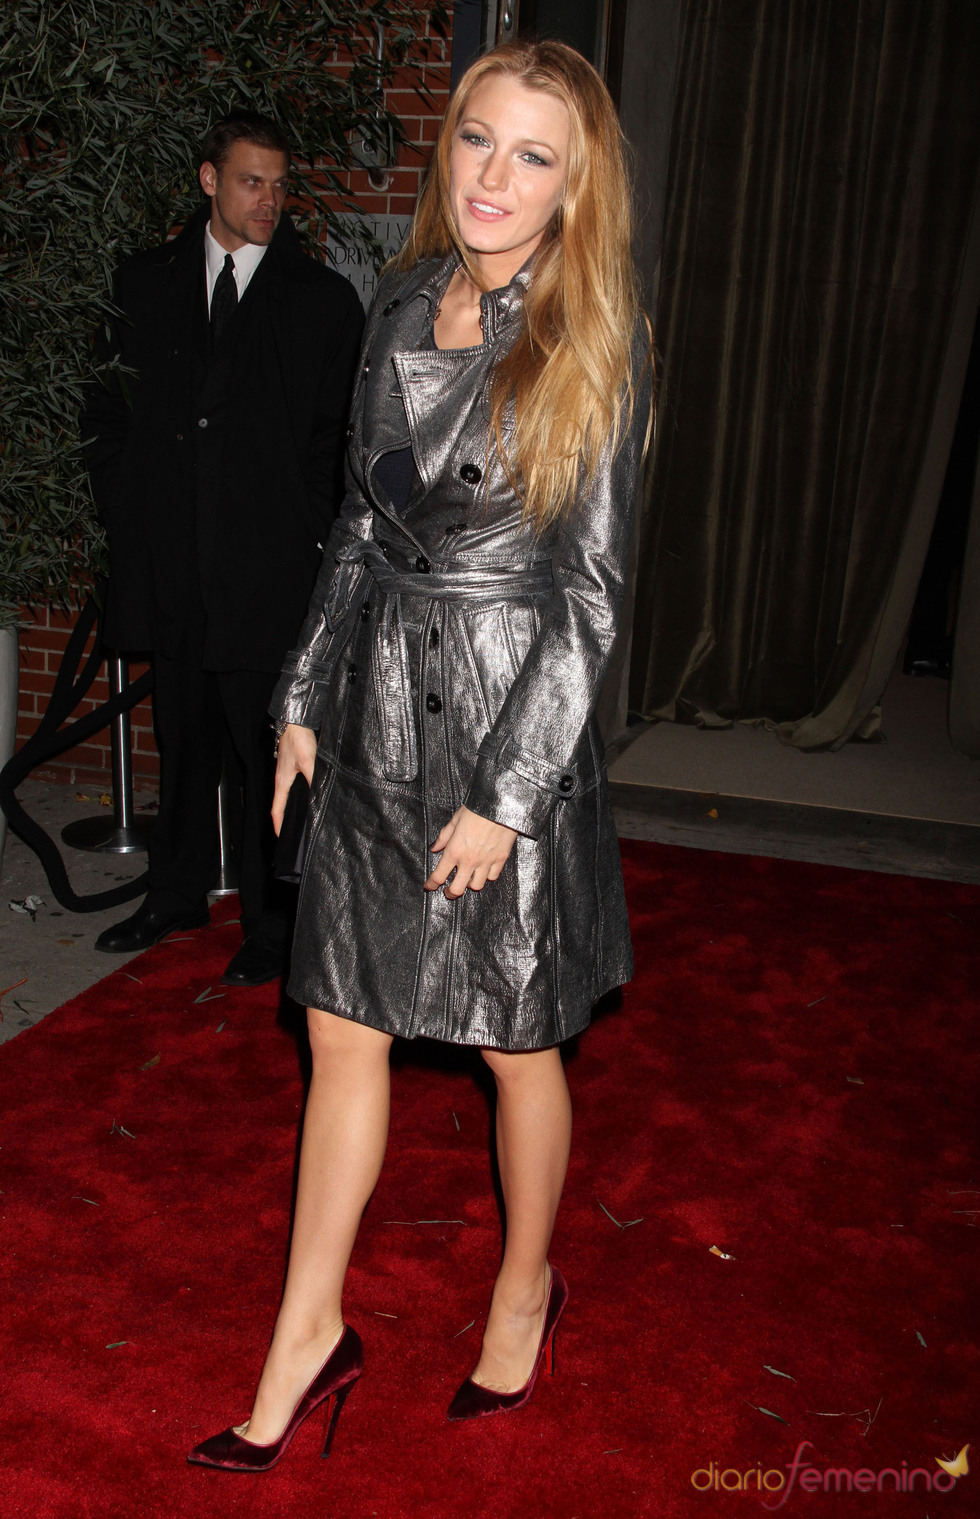 Blake Lively en los Premios Vogue Fashion Fund 2010